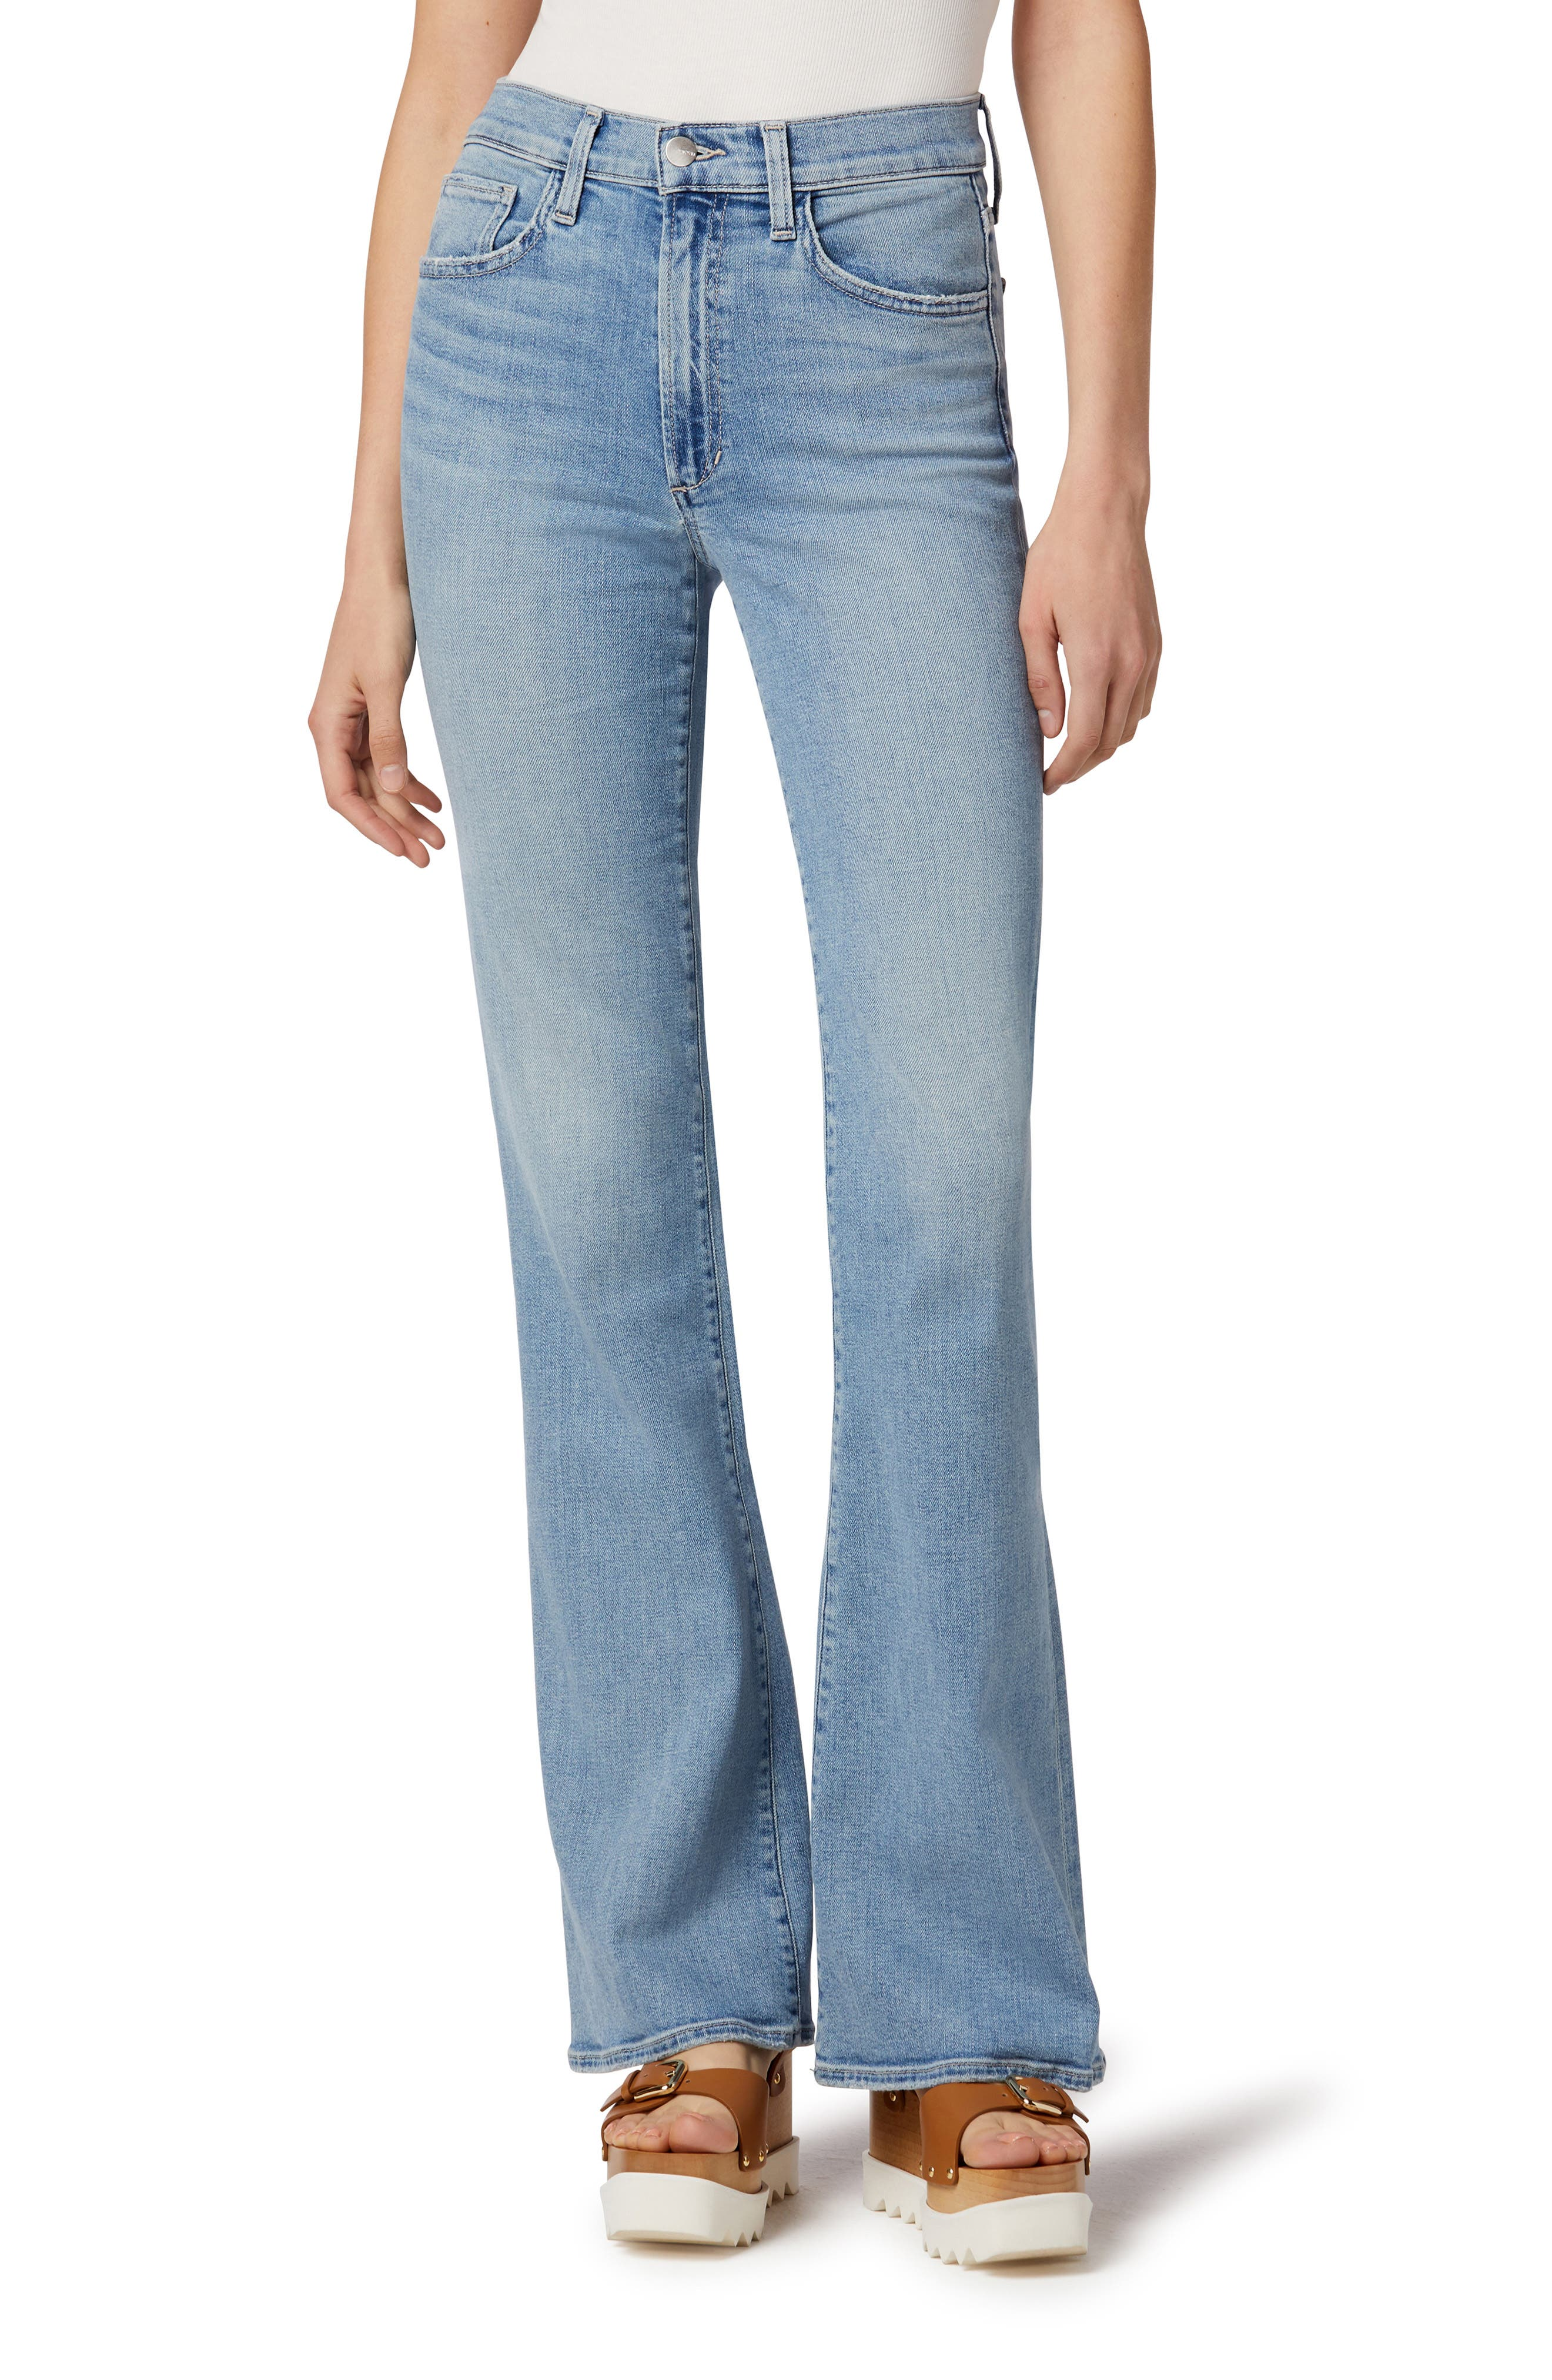 The Molly High Waist Flare Jeans